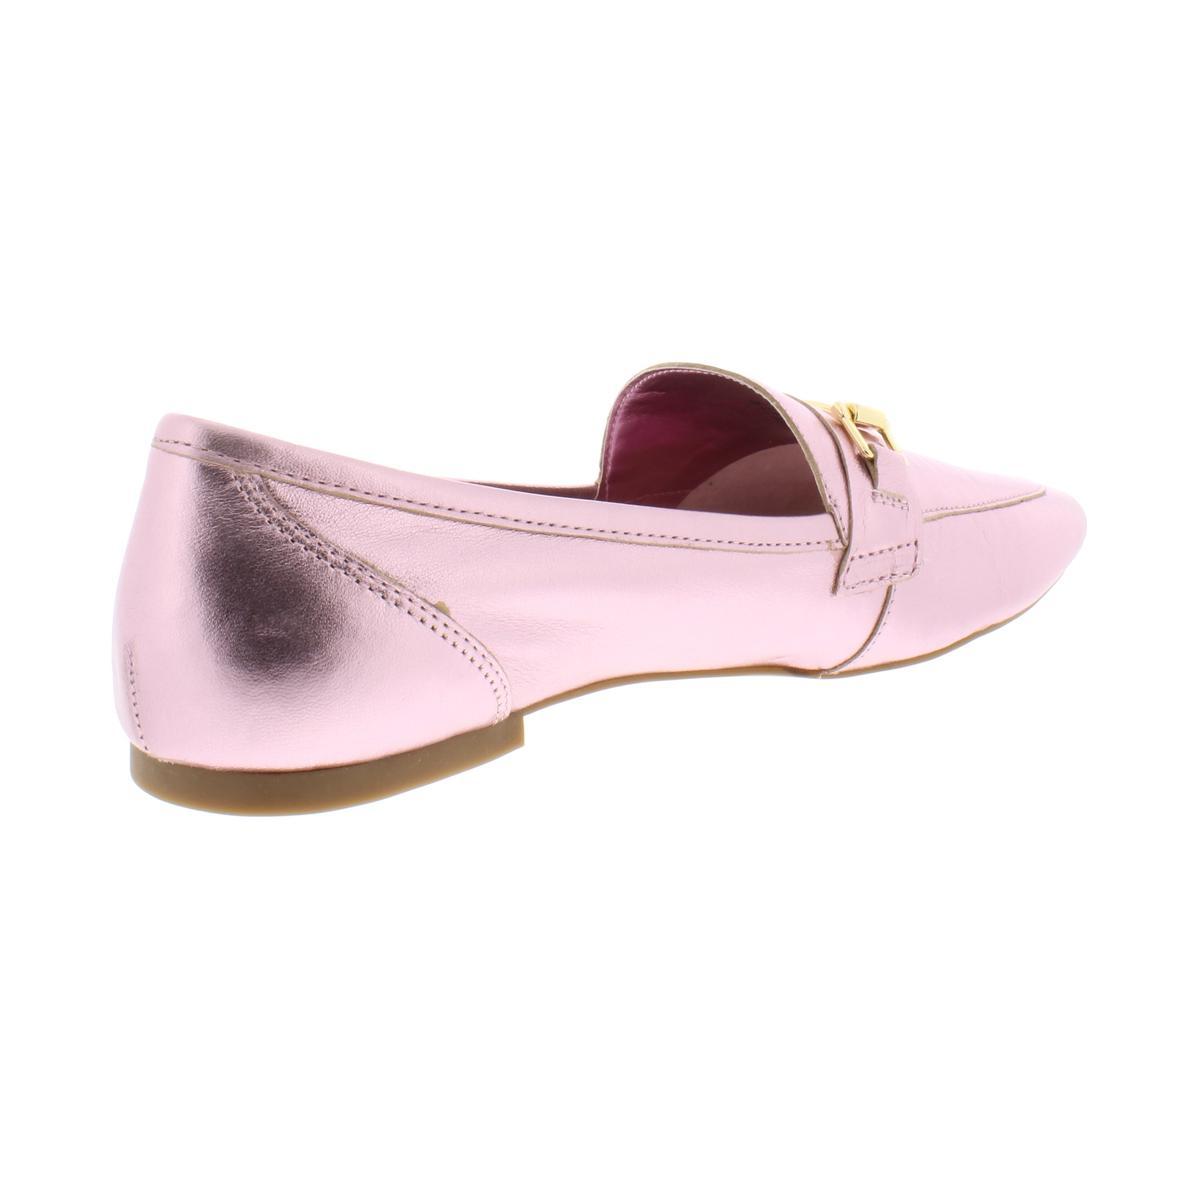 INC-Womens-Oleena-Metallic-Leather-Slip-On-Loafers-Flats-BHFO-6692 thumbnail 4